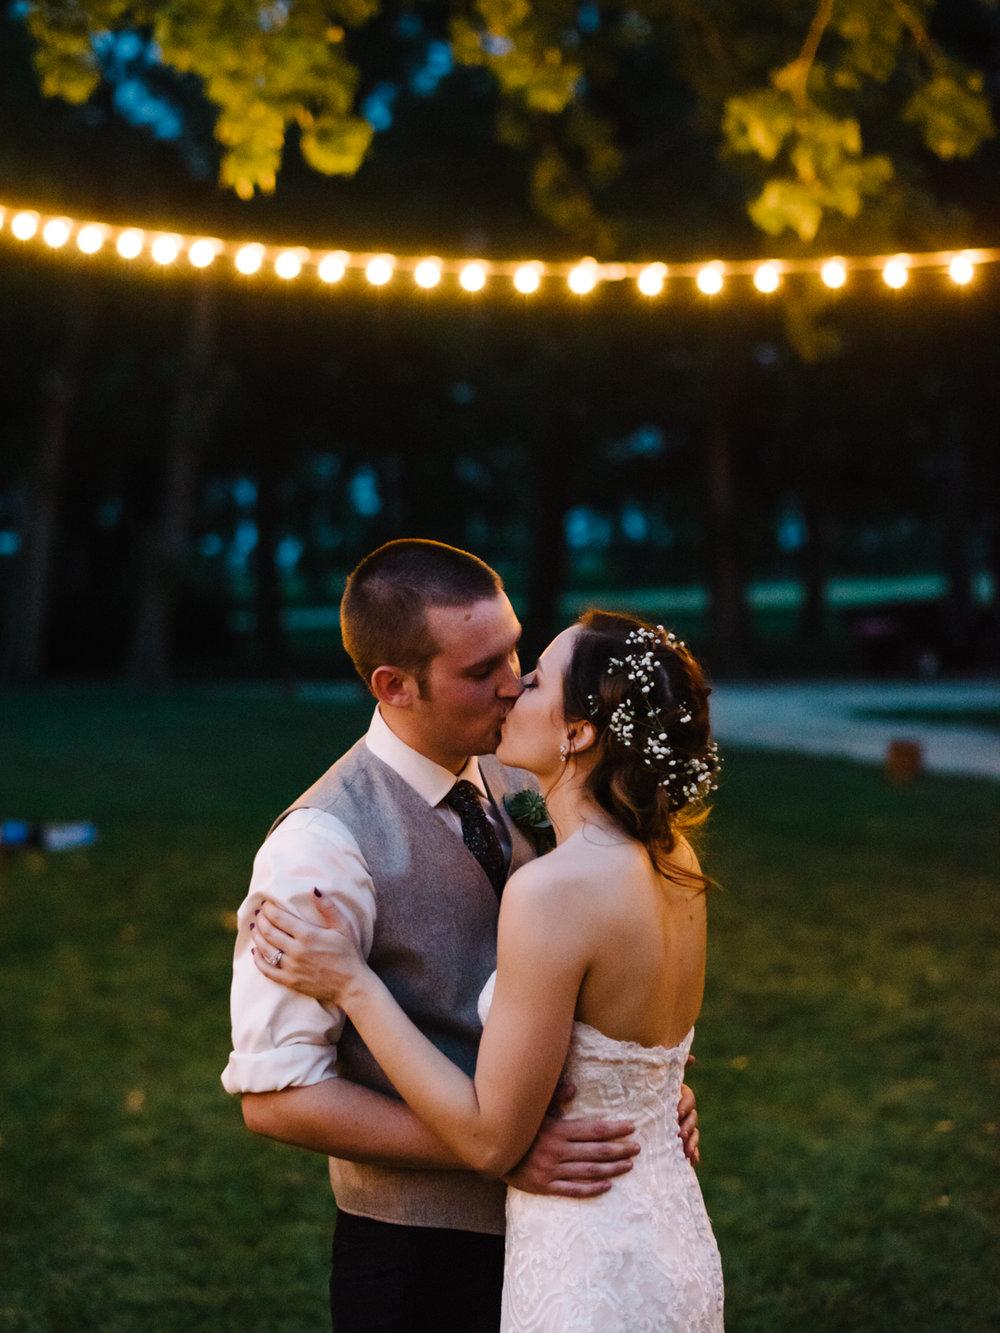 Wichita, Kansas Wedding Photographer-Neal Dieker-Kansas Outdoor Wedding-Barn Wedding-Wichita, Ks Wedding Photography-262.jpg